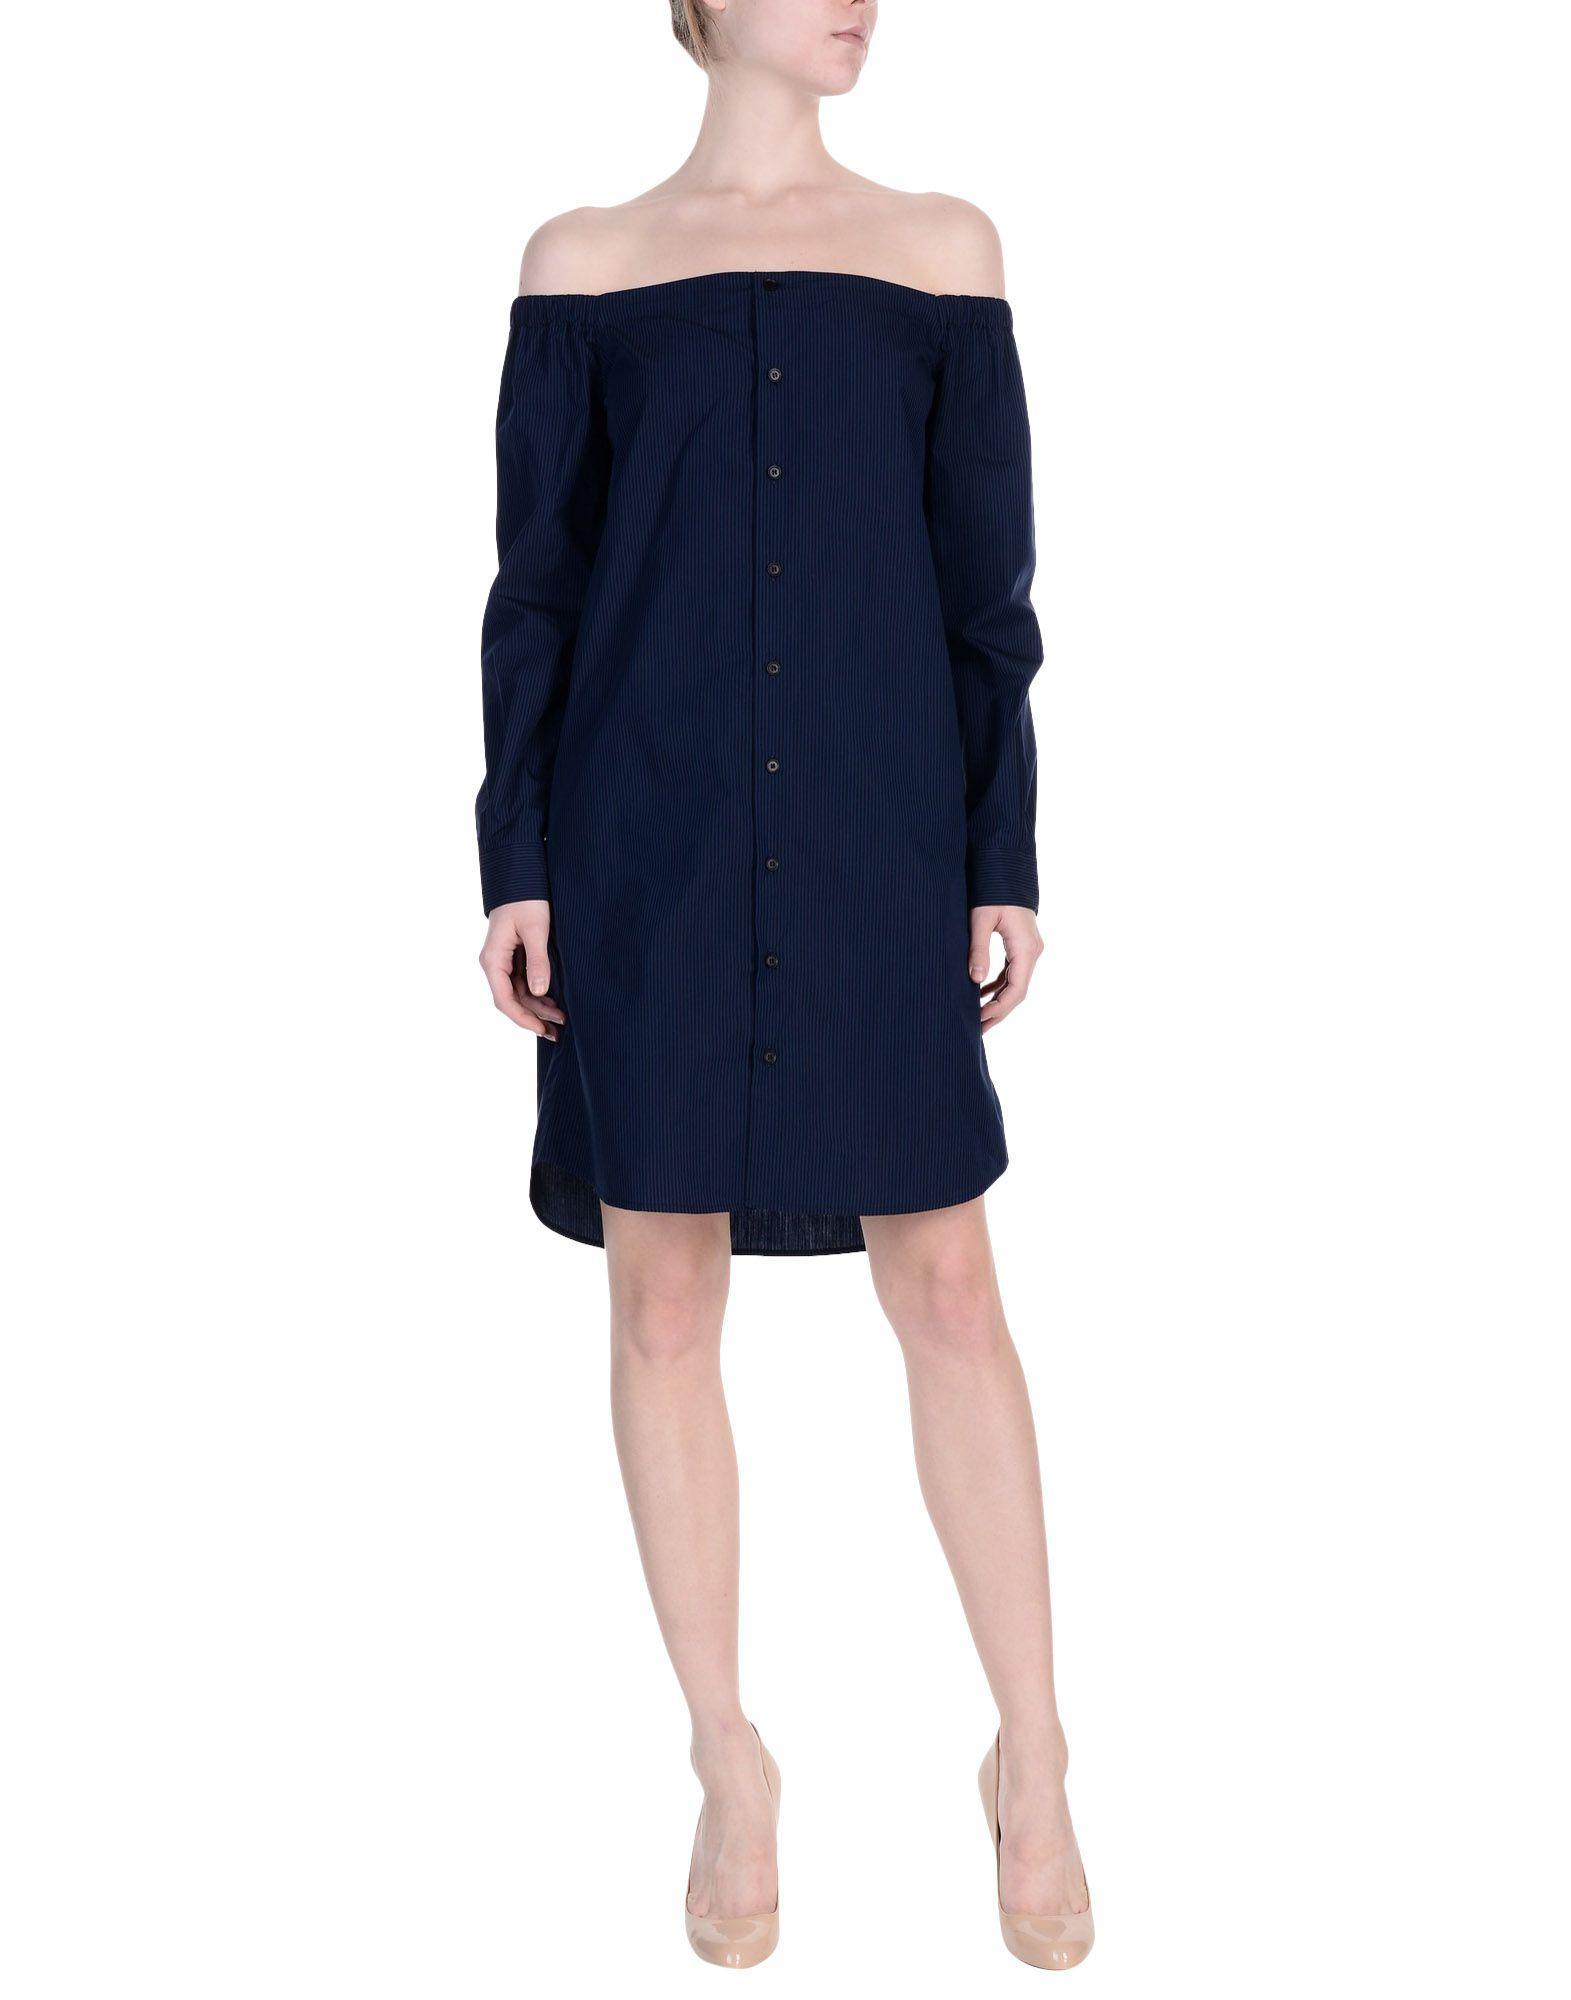 Diesel Black Gold Short Dresses In Dark Blue